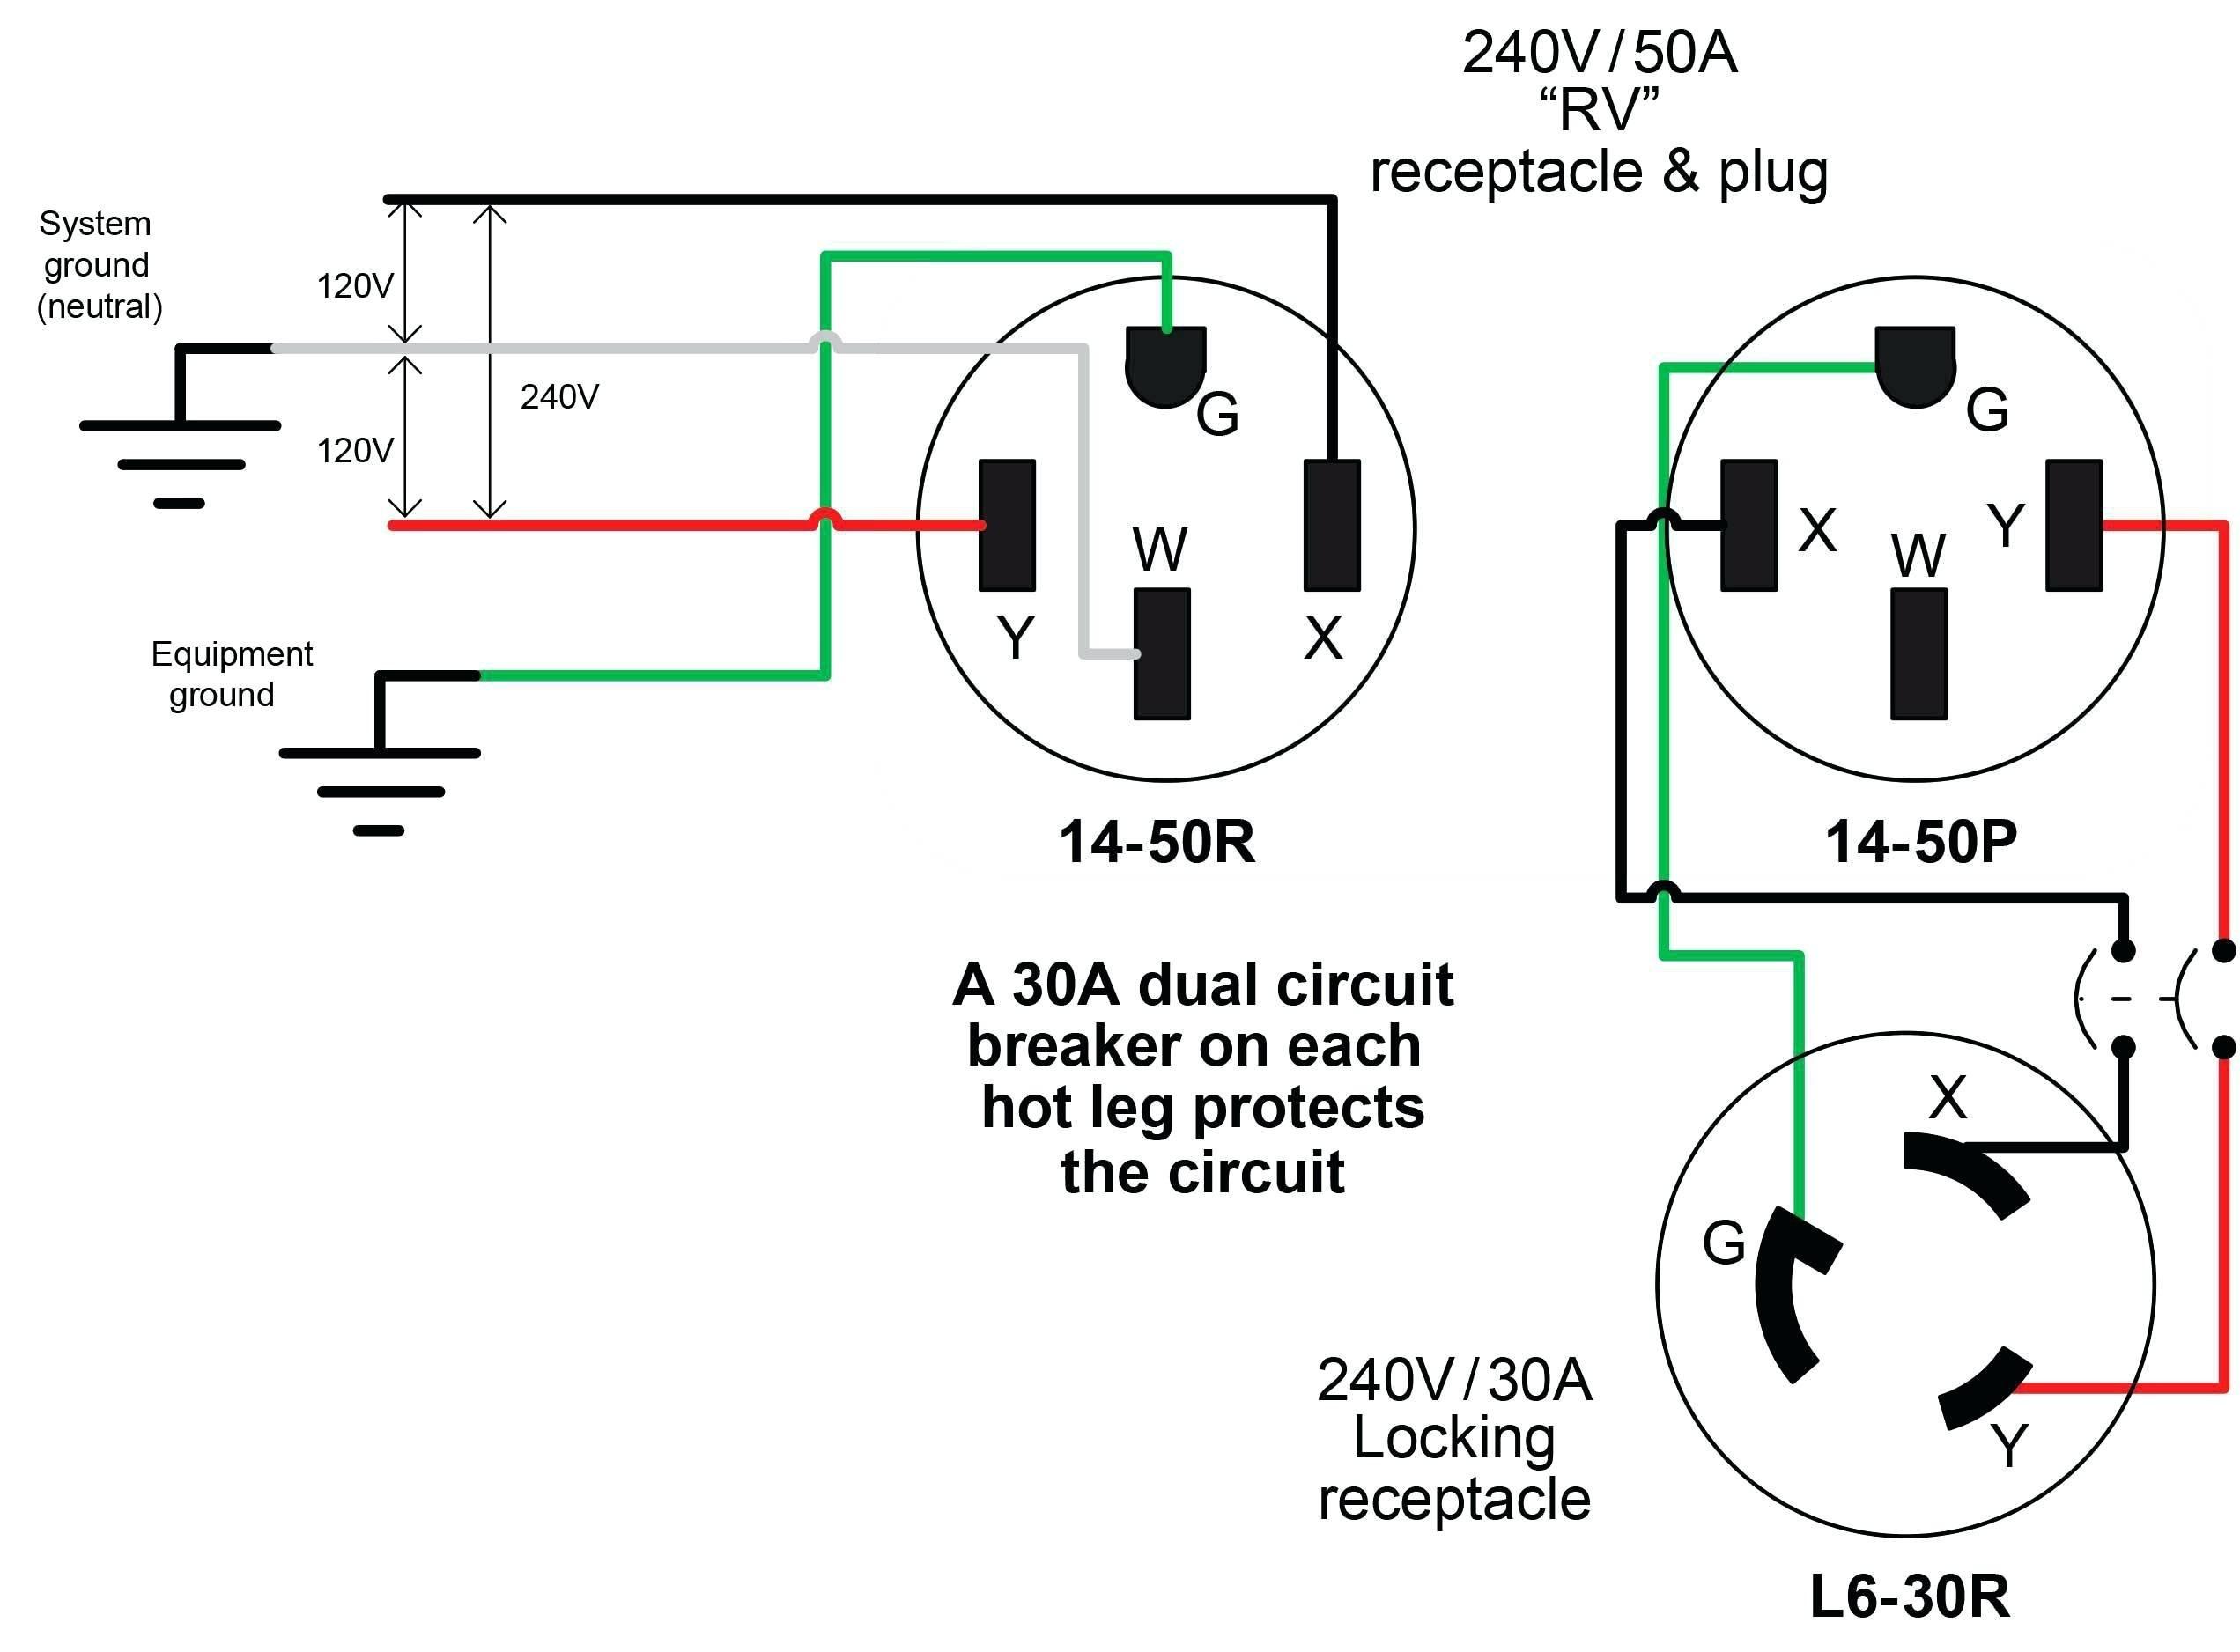 3 5 Mm Jack Wiring Diagram 3 5 Mm Plug Wire Diagram Wiring Data Of 3 5 Mm Jack Wiring Diagram